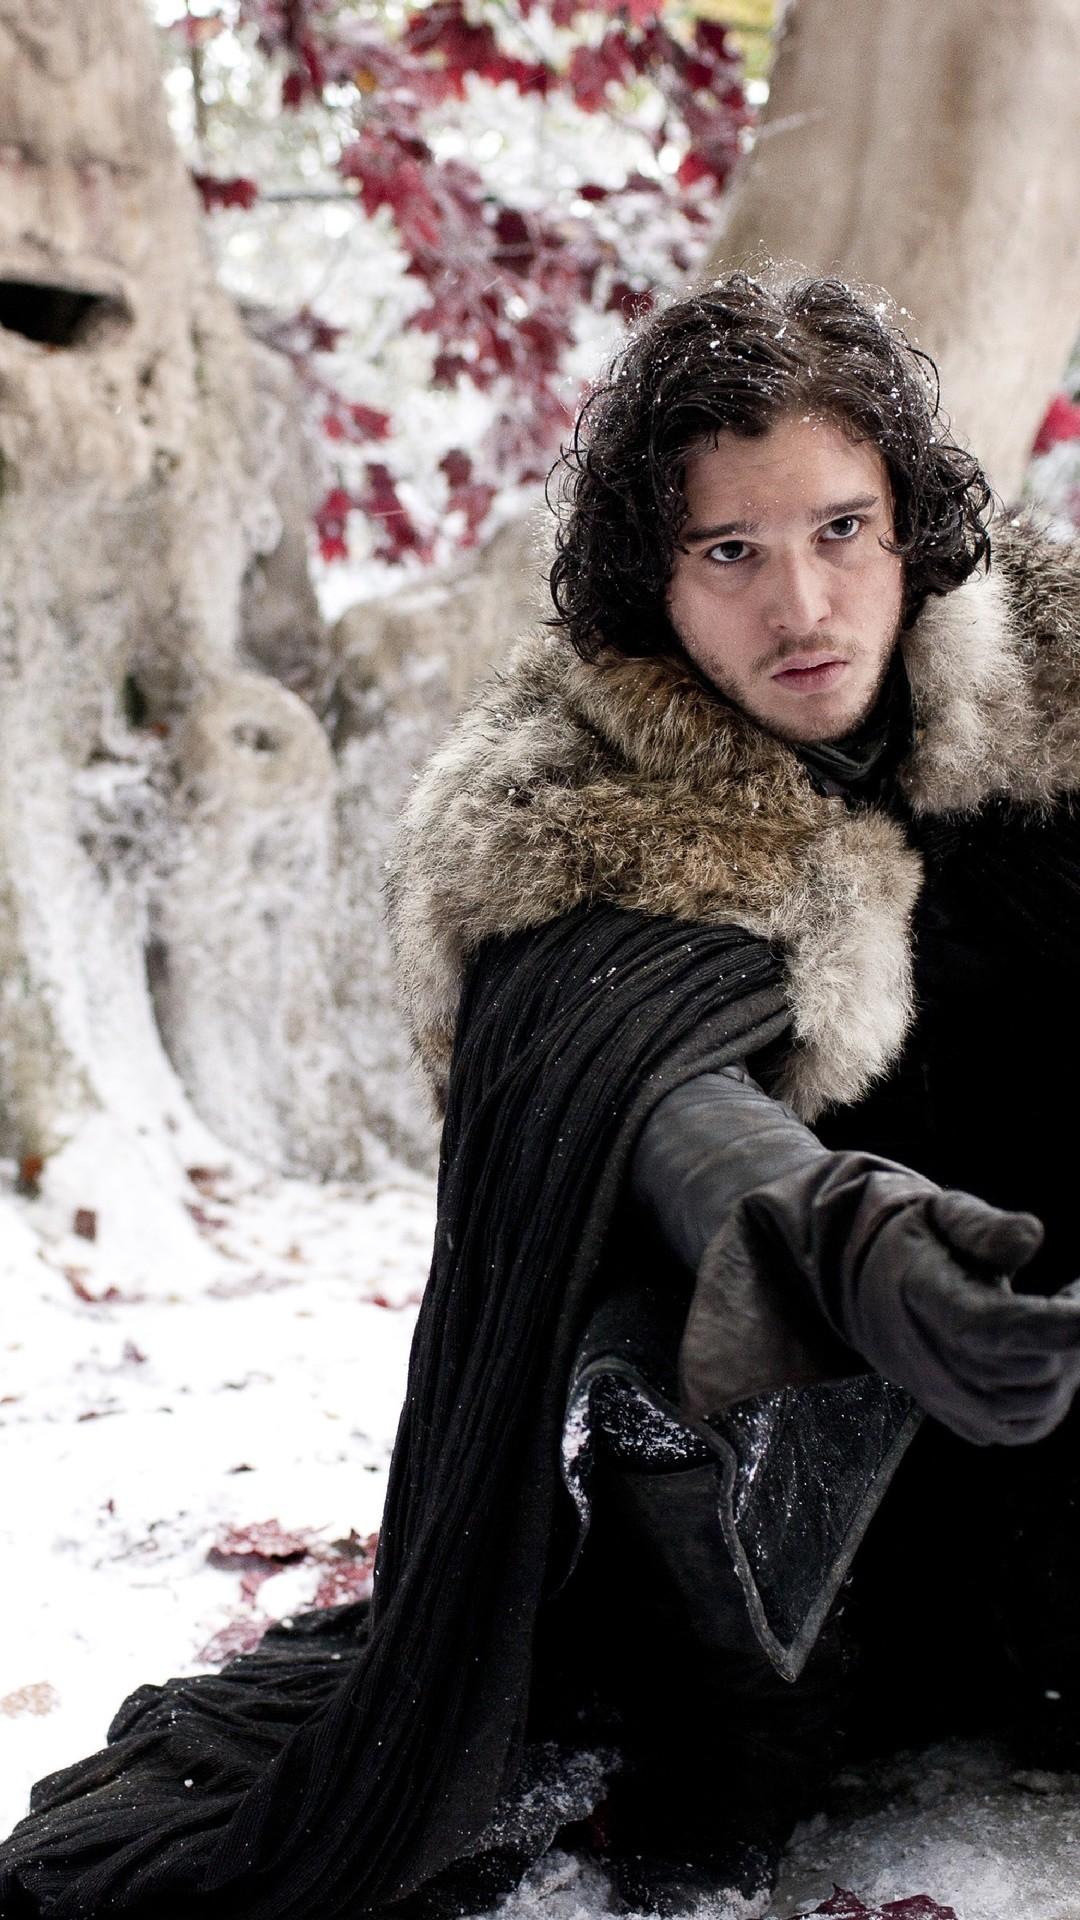 Jon Snow in Game Of Thrones 4K Ultra HD wallpaper   4k-Wallpaper.Net